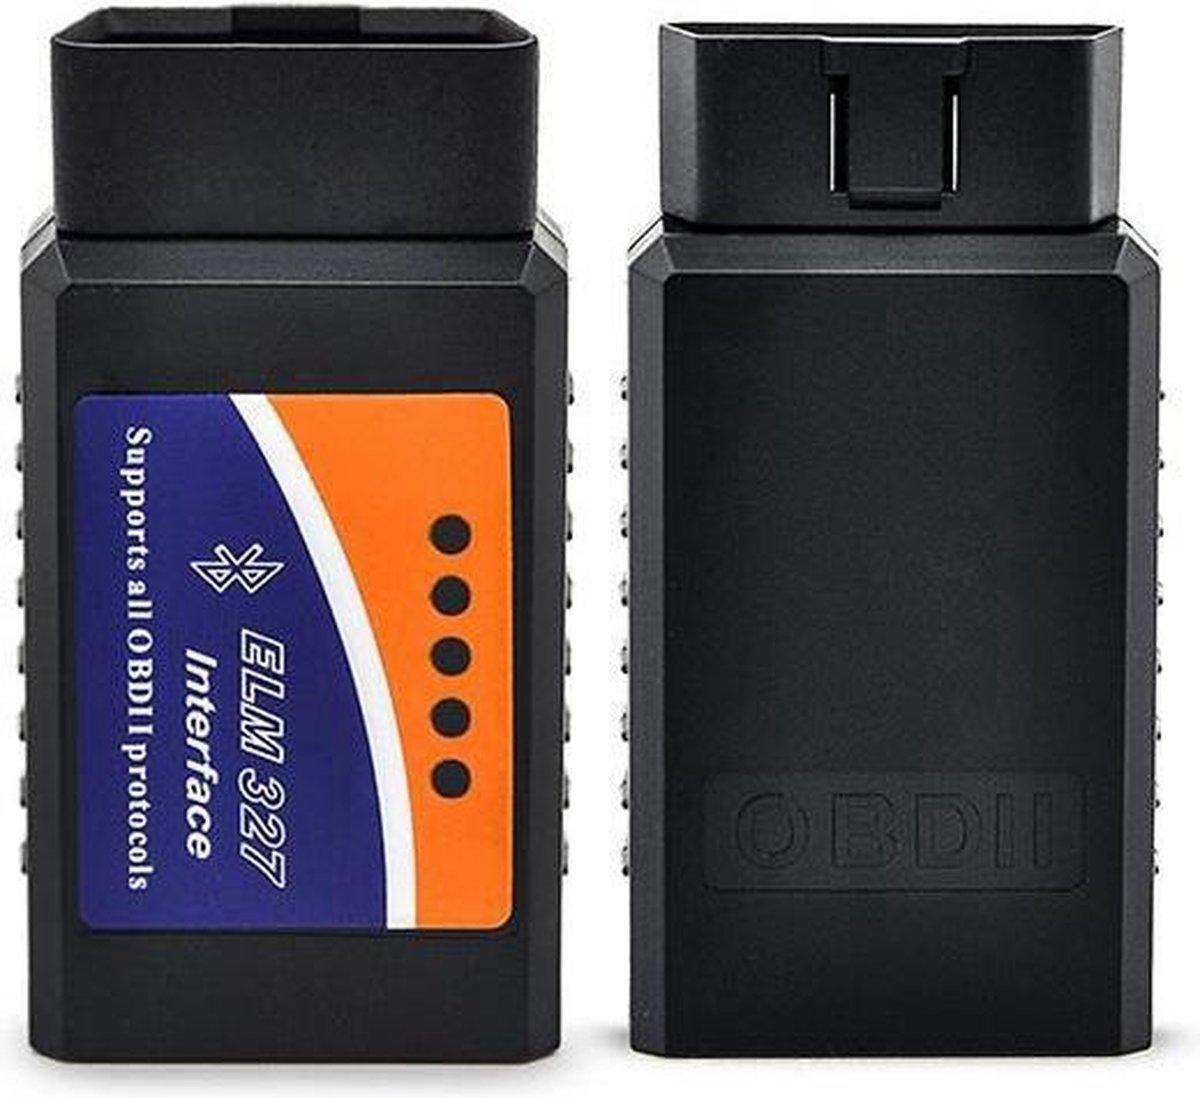 OBD2 scanner bluetooth   ELM327   OBDII   auto computer uitlezen   Car reader   Diagnose